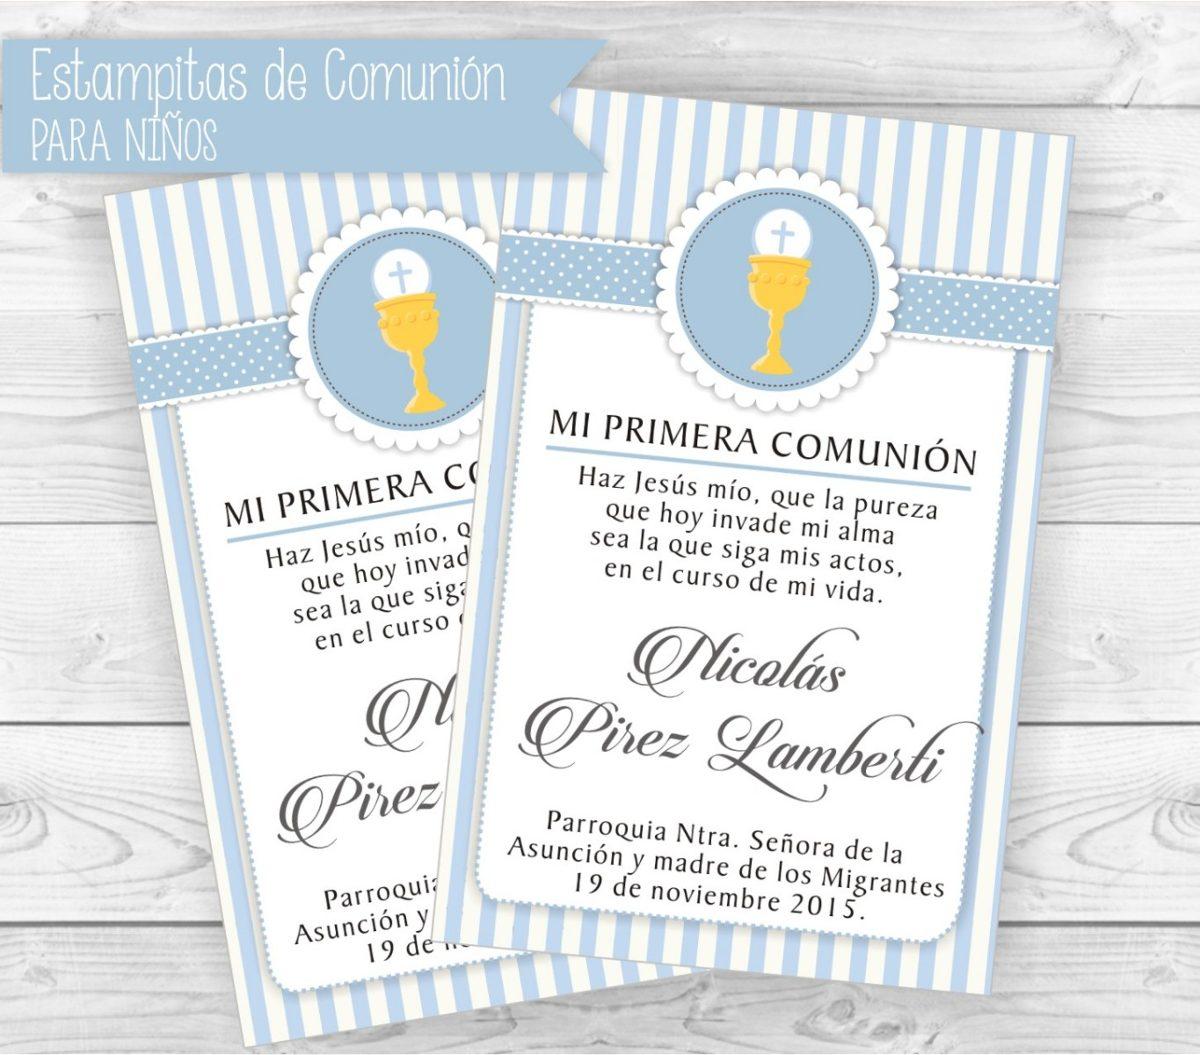 a49b25032b0d6 Estampitas Comunión Tarjetas Invitación Souvenir Niño Varón -   16 ...